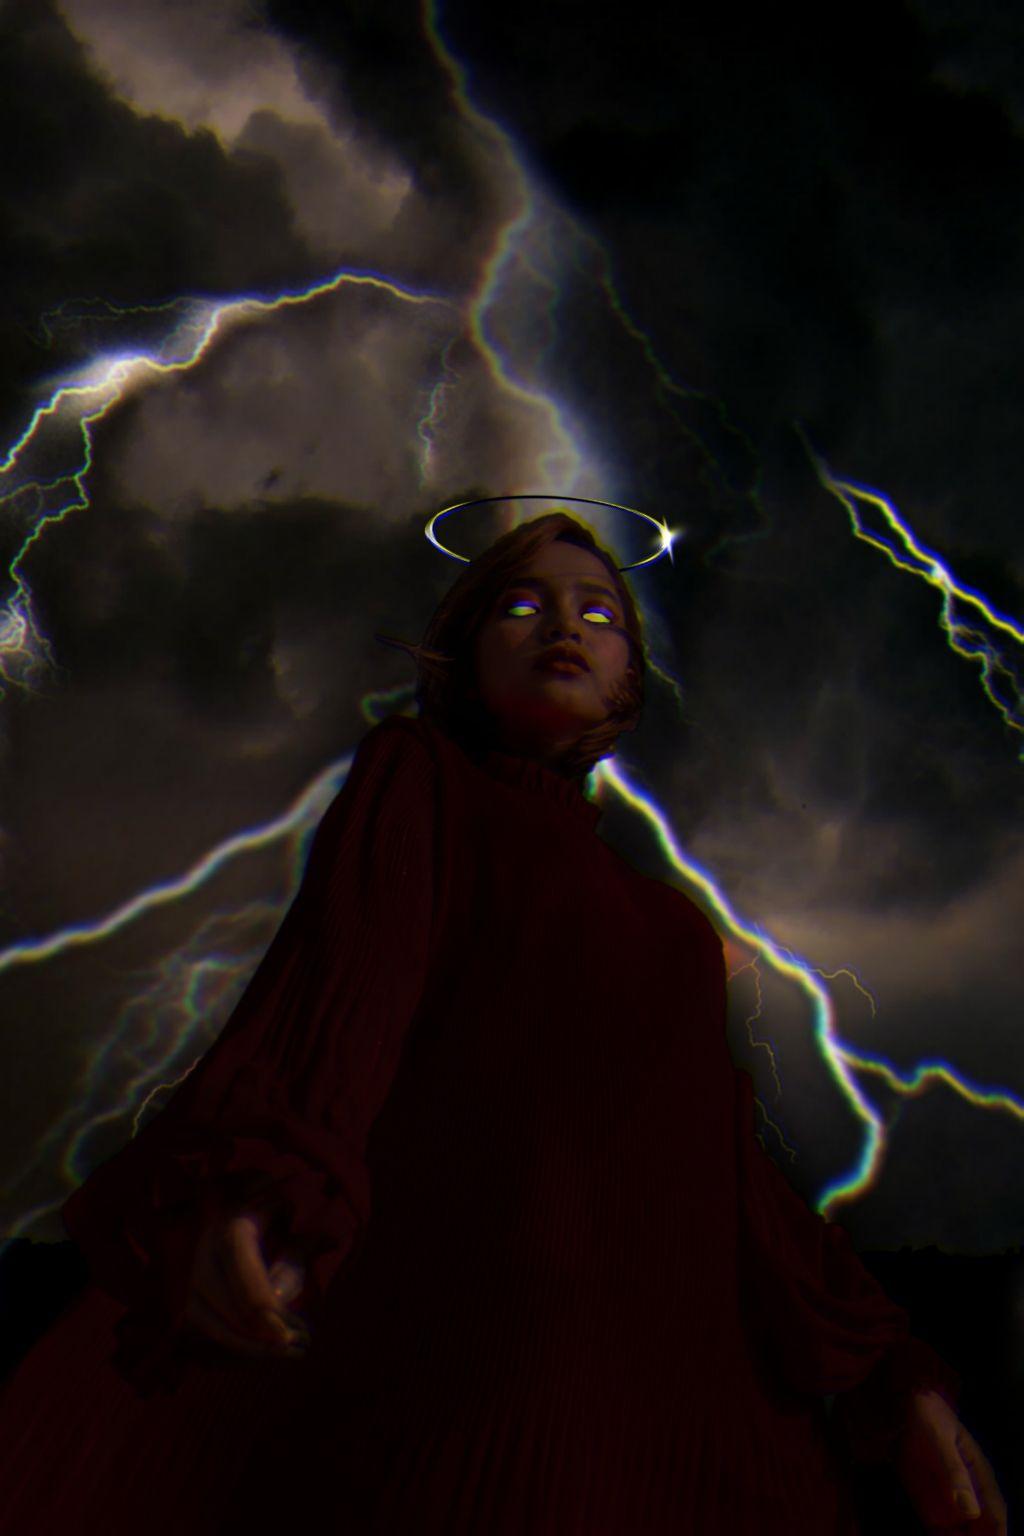 storm master  #freetoedit #remixit #girl #woman #sky #storm #lightning #glitch #black #grunge #dark #angel #devil #evil